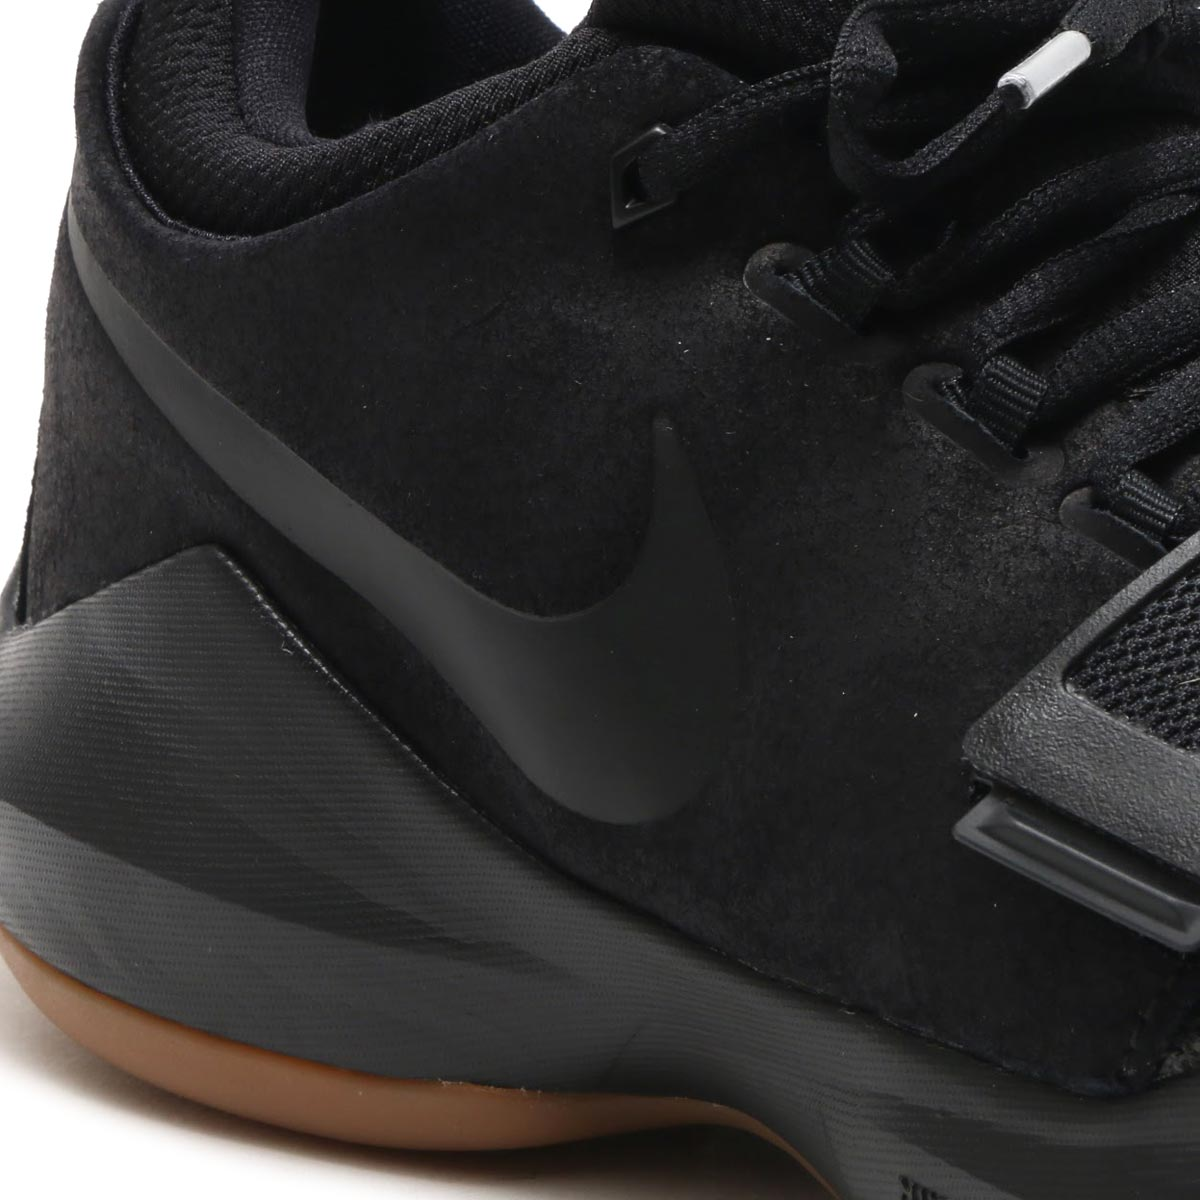 quality design 257aa fc0f8 ... NIKE PG 1 EP (Nike PG 1 EP) BLACK BLACK-ANTHRACITE- ...